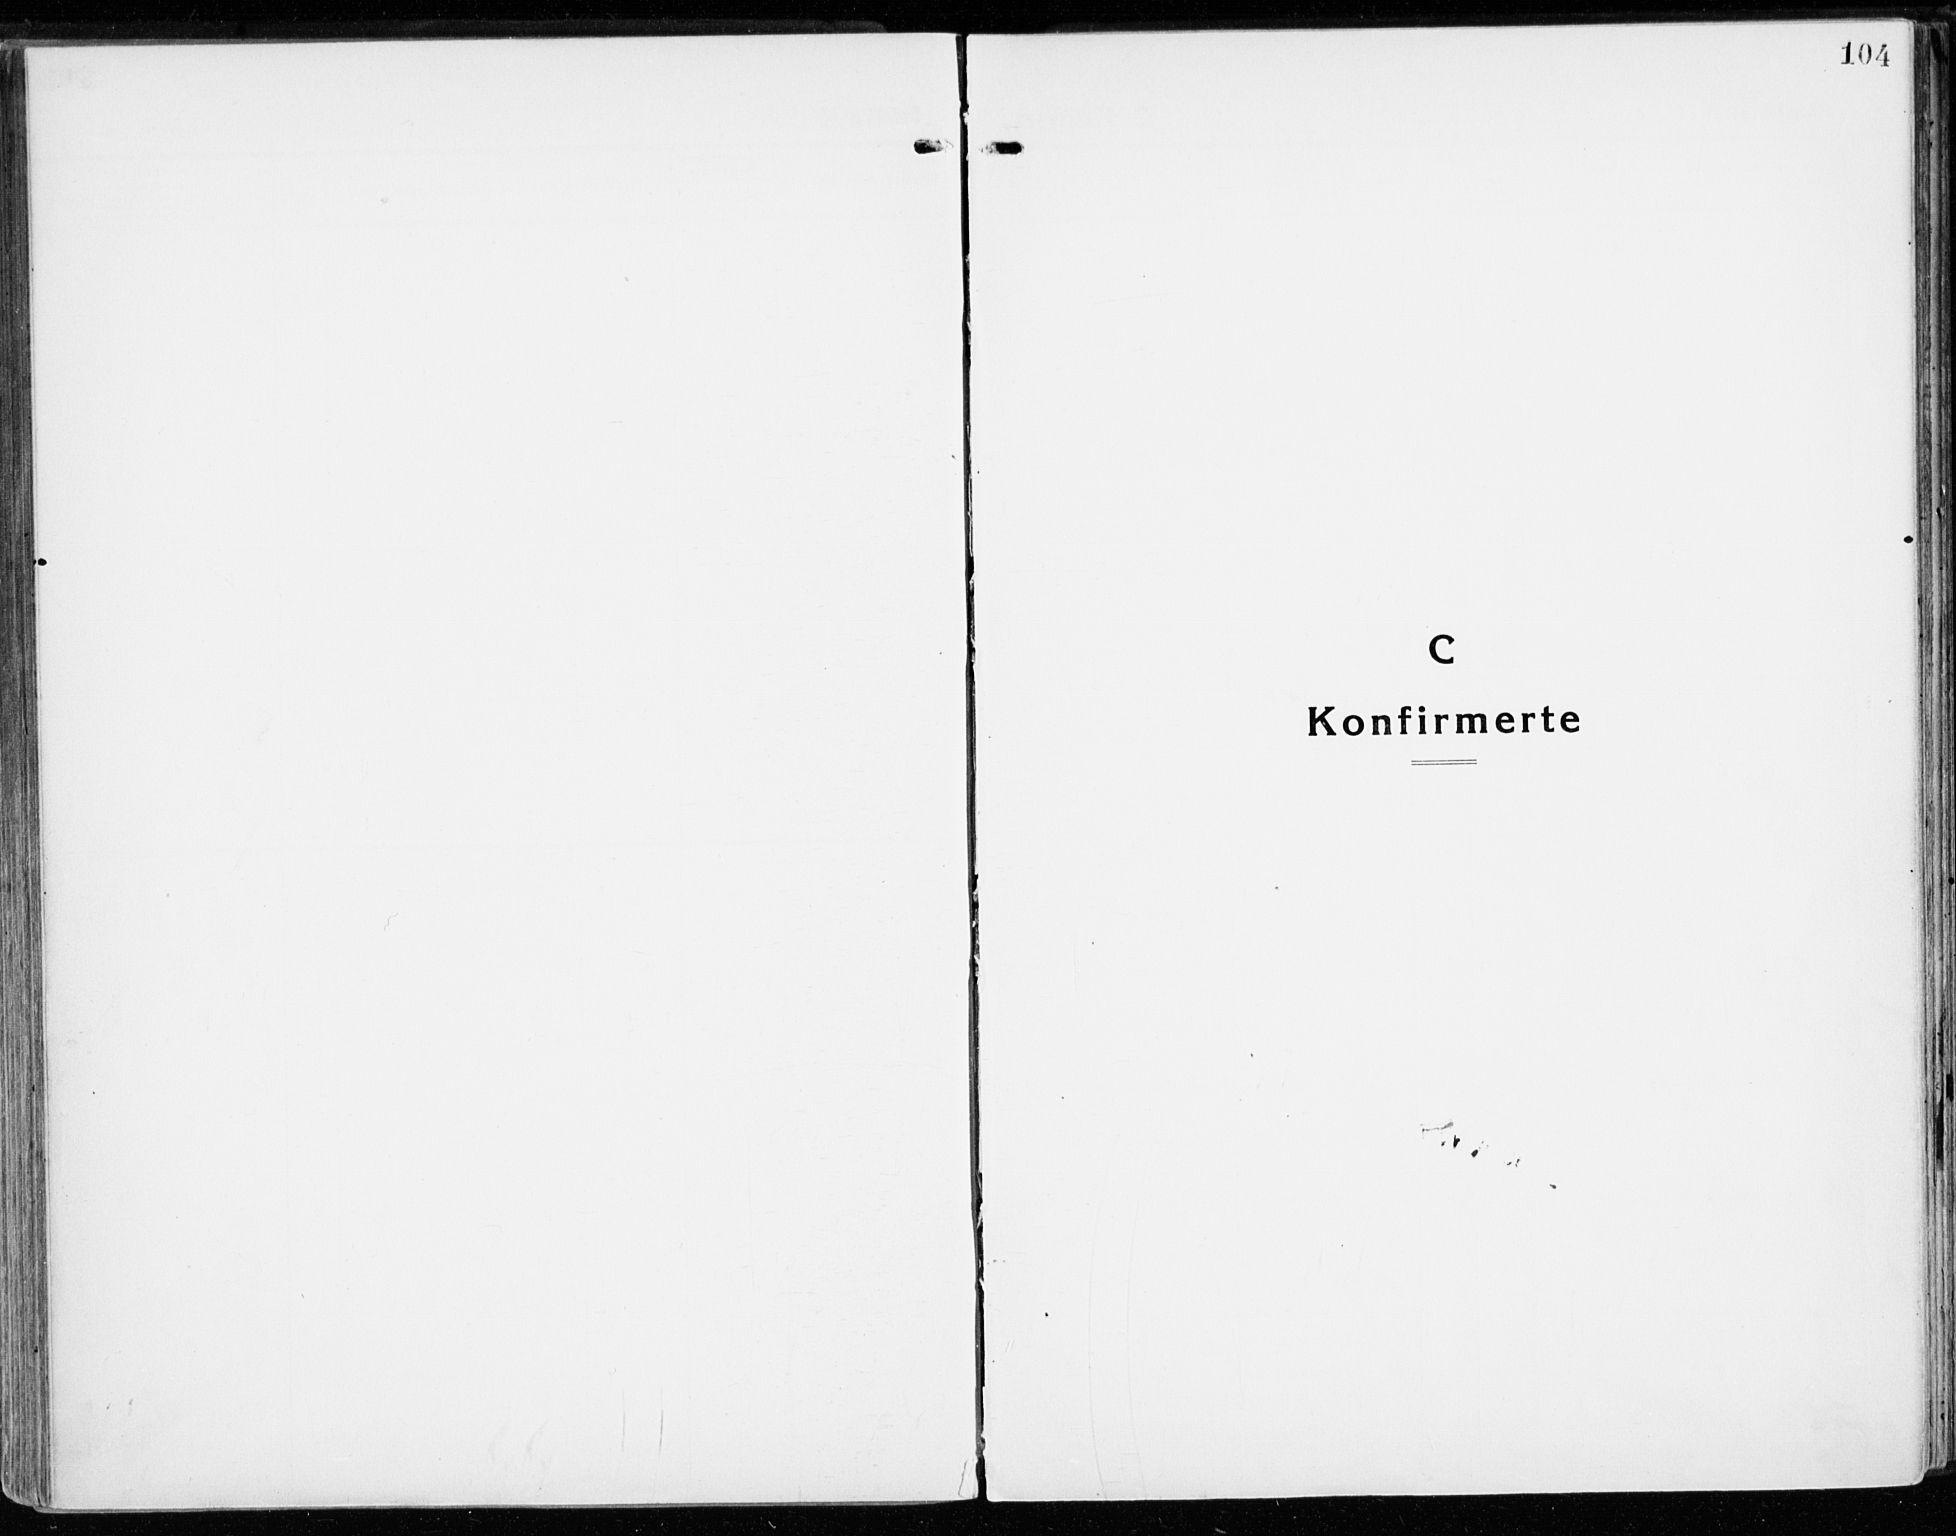 SAH, Stange prestekontor, K/L0025: Ministerialbok nr. 25, 1921-1945, s. 104